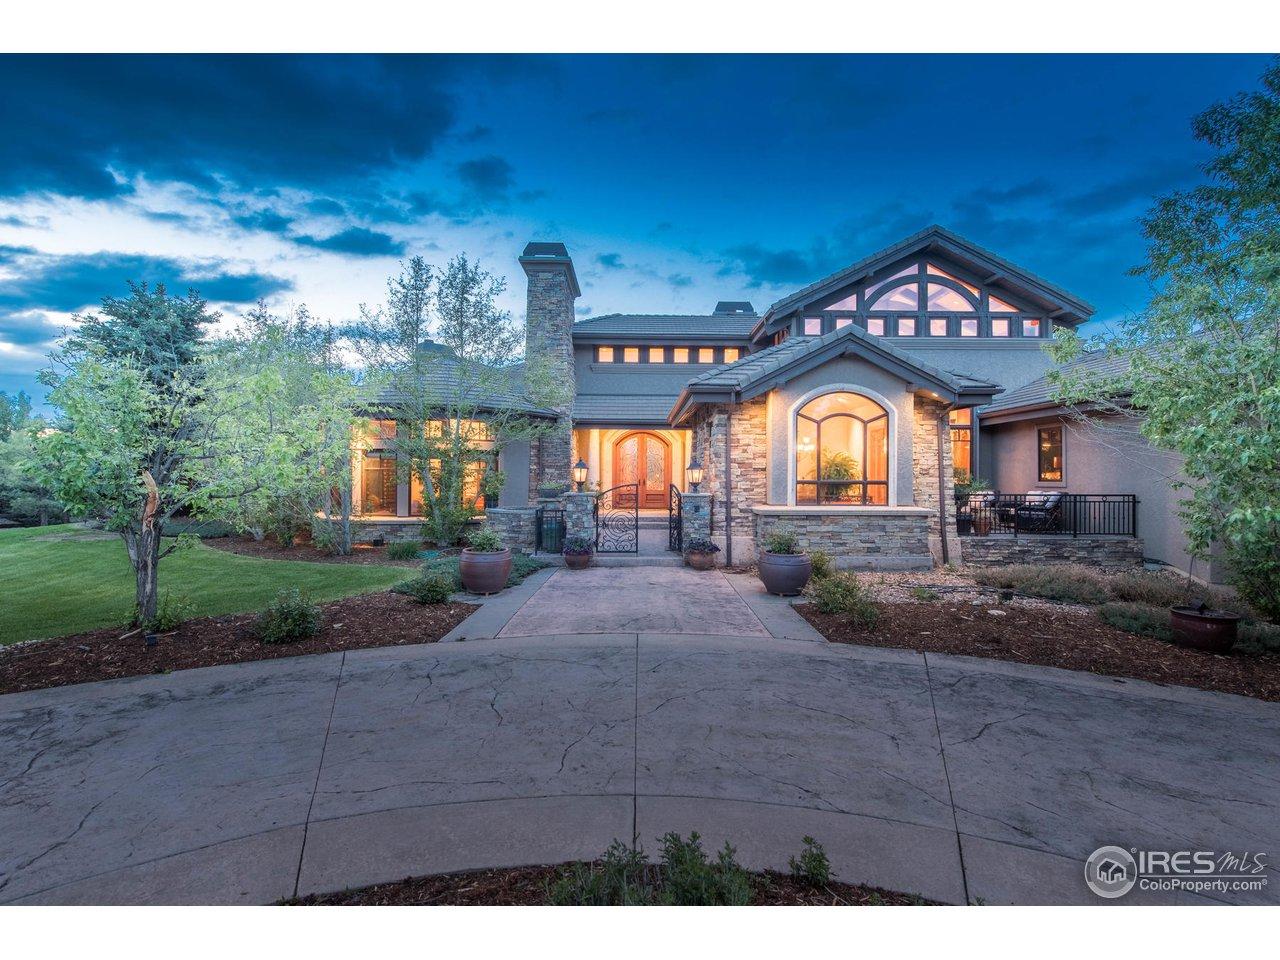 1110 White Hawk Ranch Dr, Boulder CO 80303